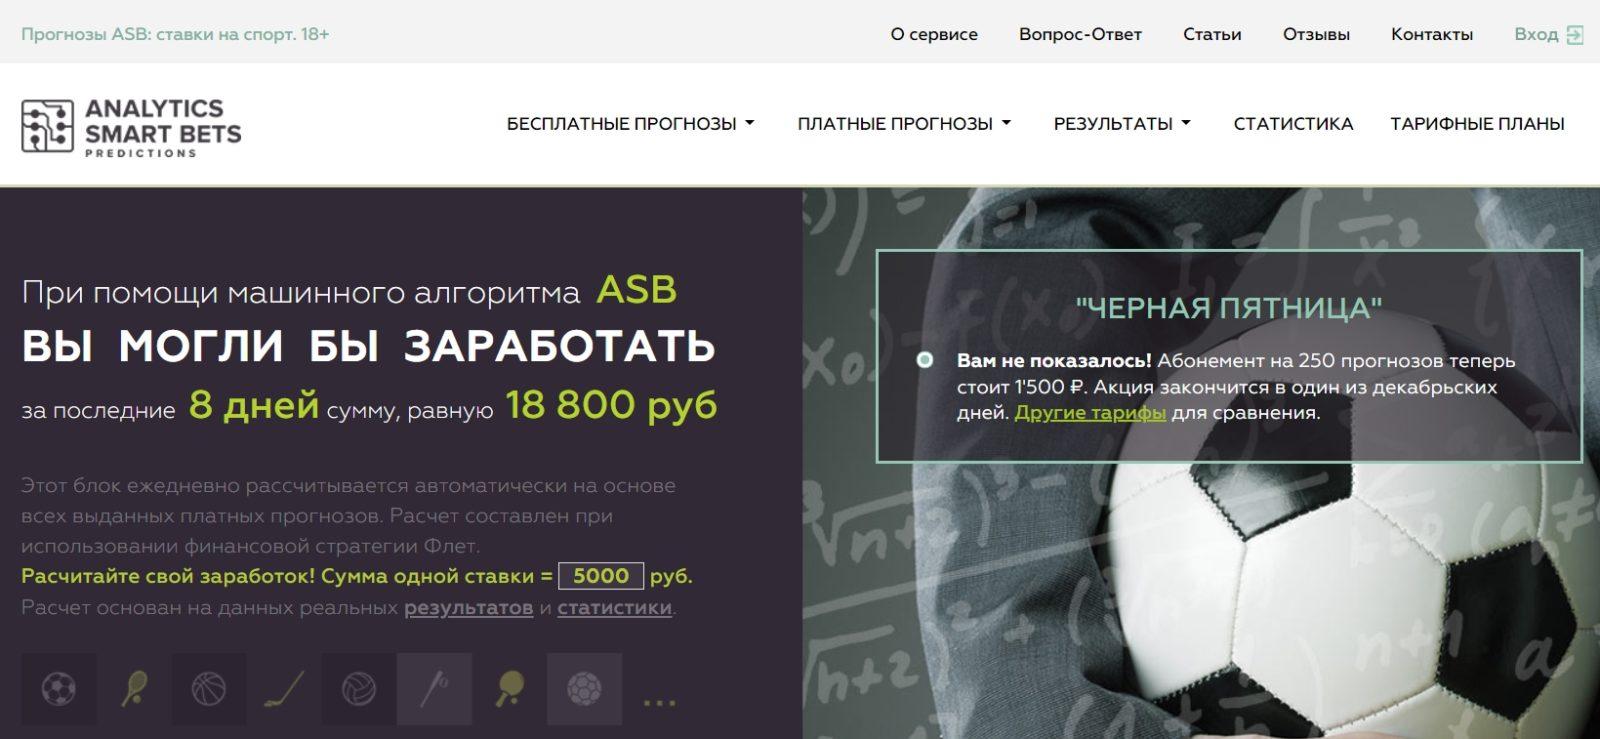 Отзывы о ставках от ASB Predictions (Gamblingsupport.ru)